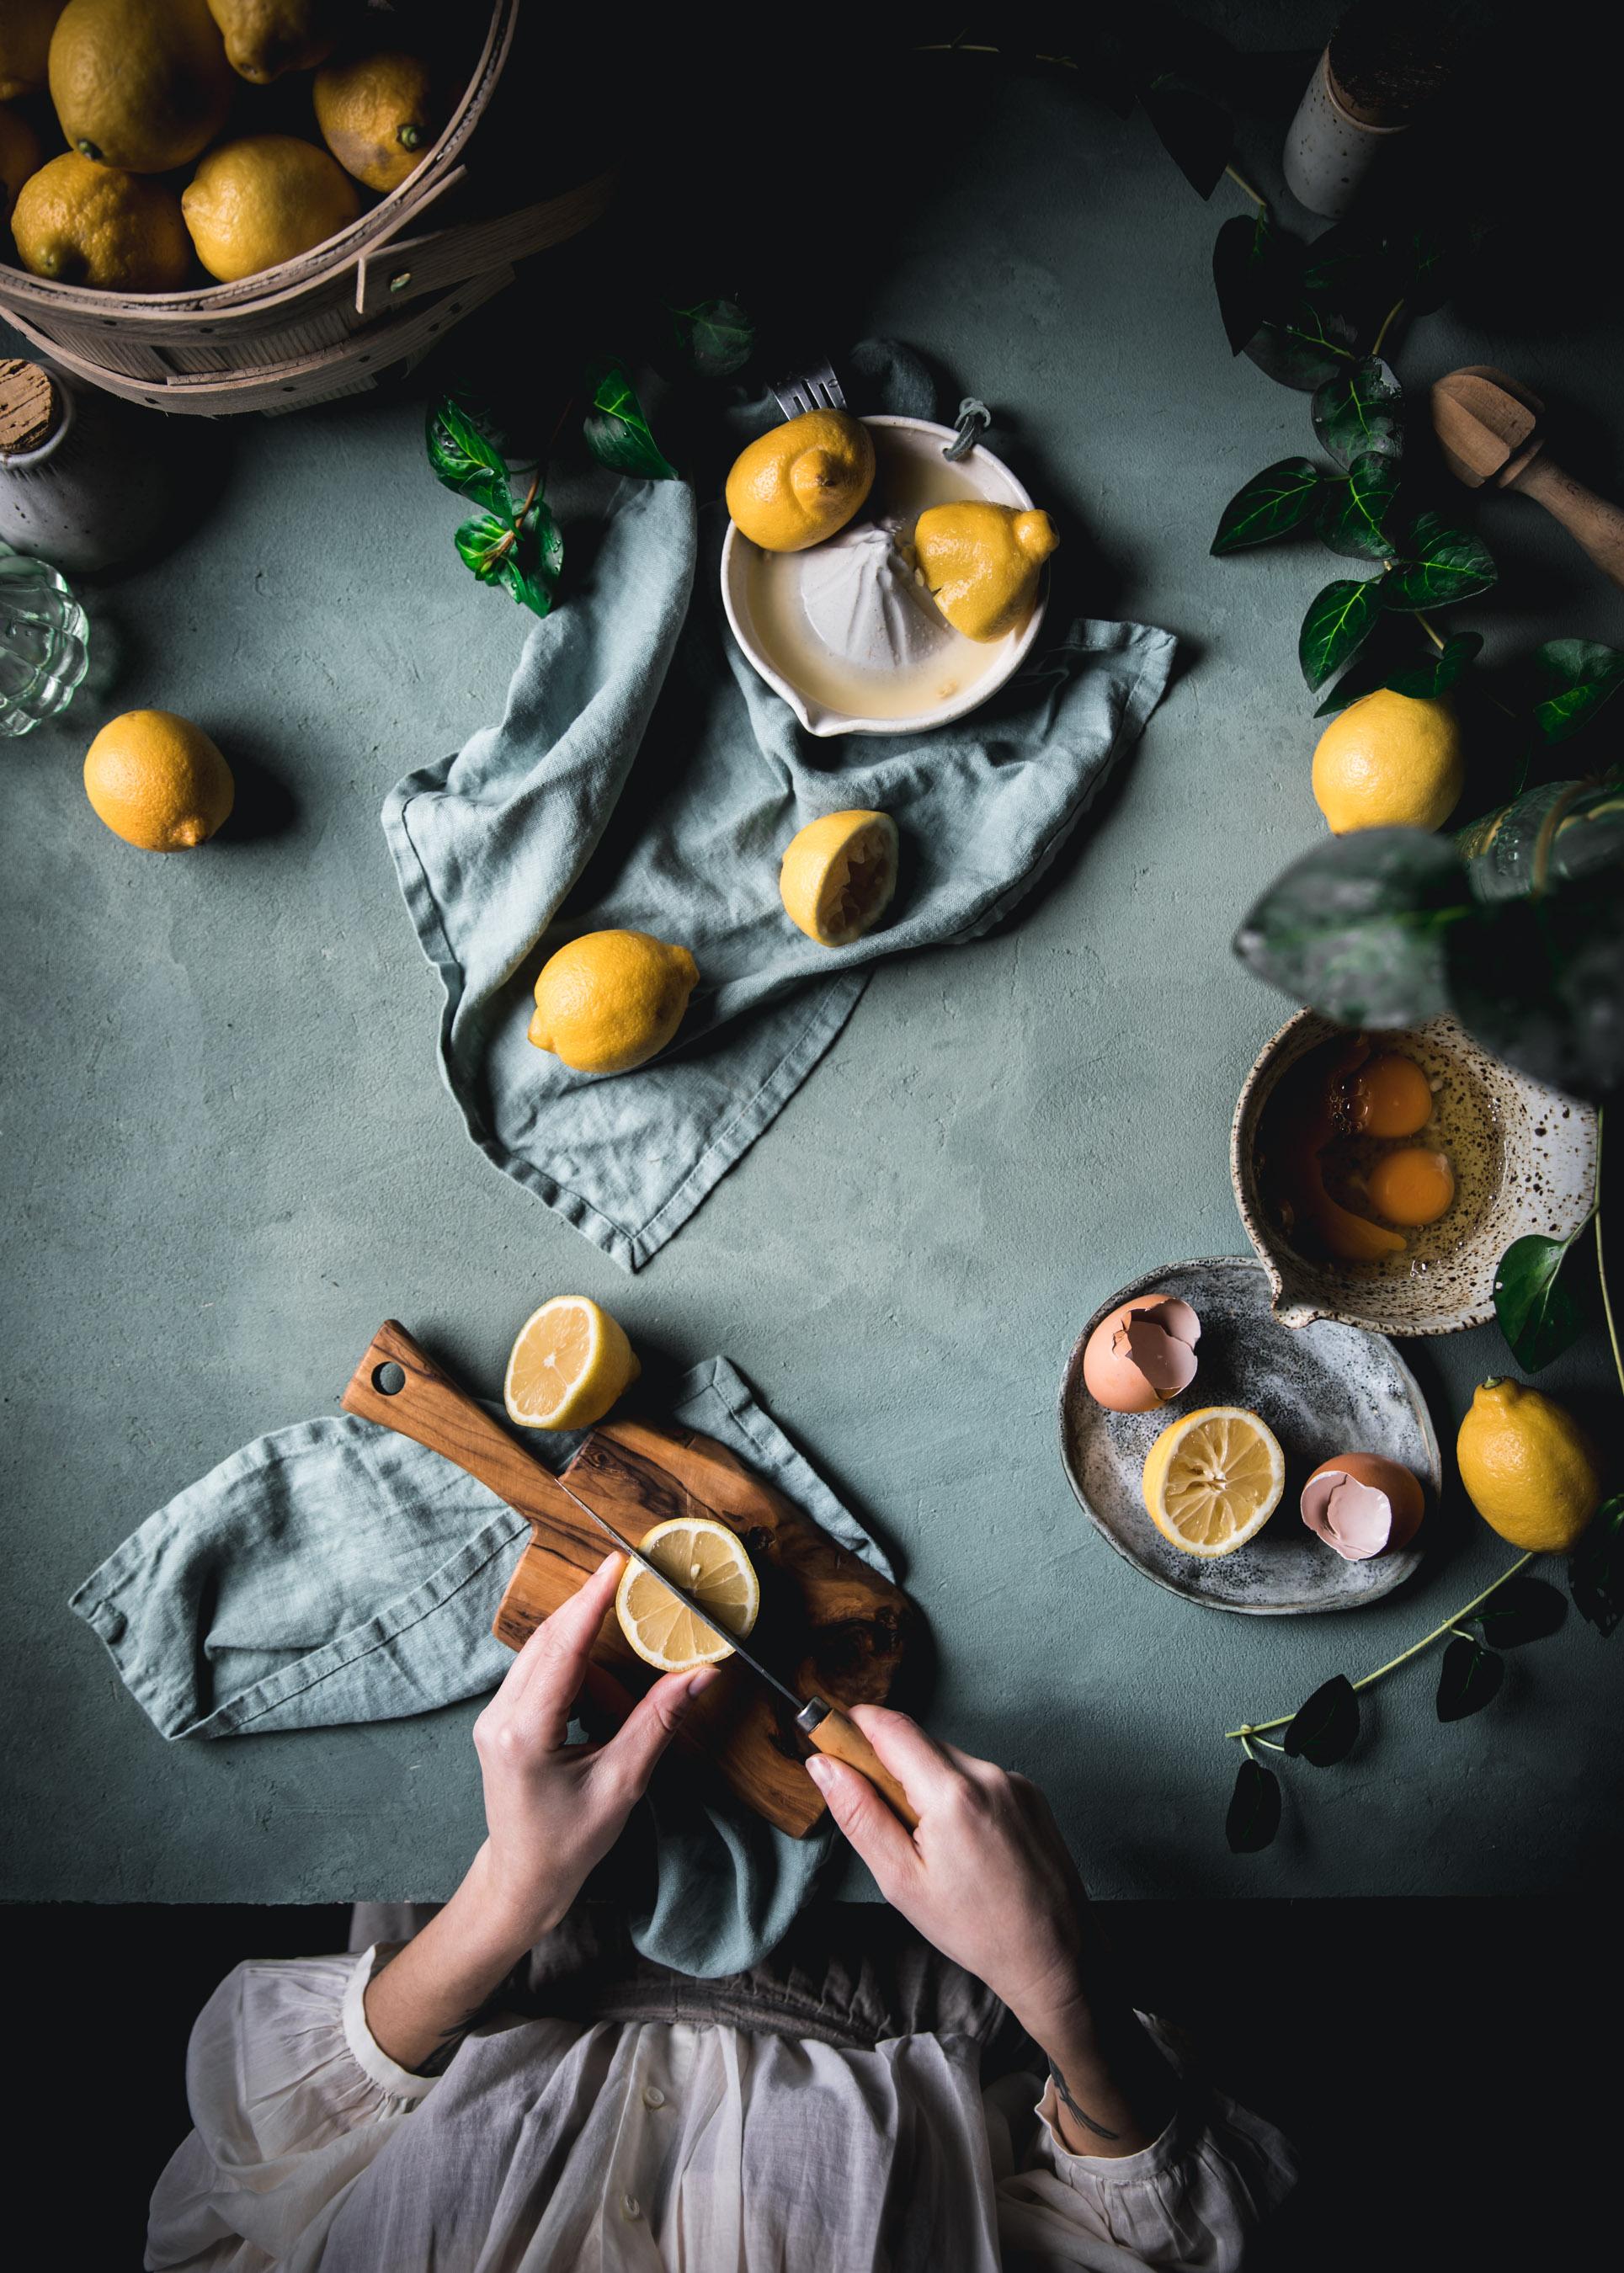 Lemon Slicing Food Photography